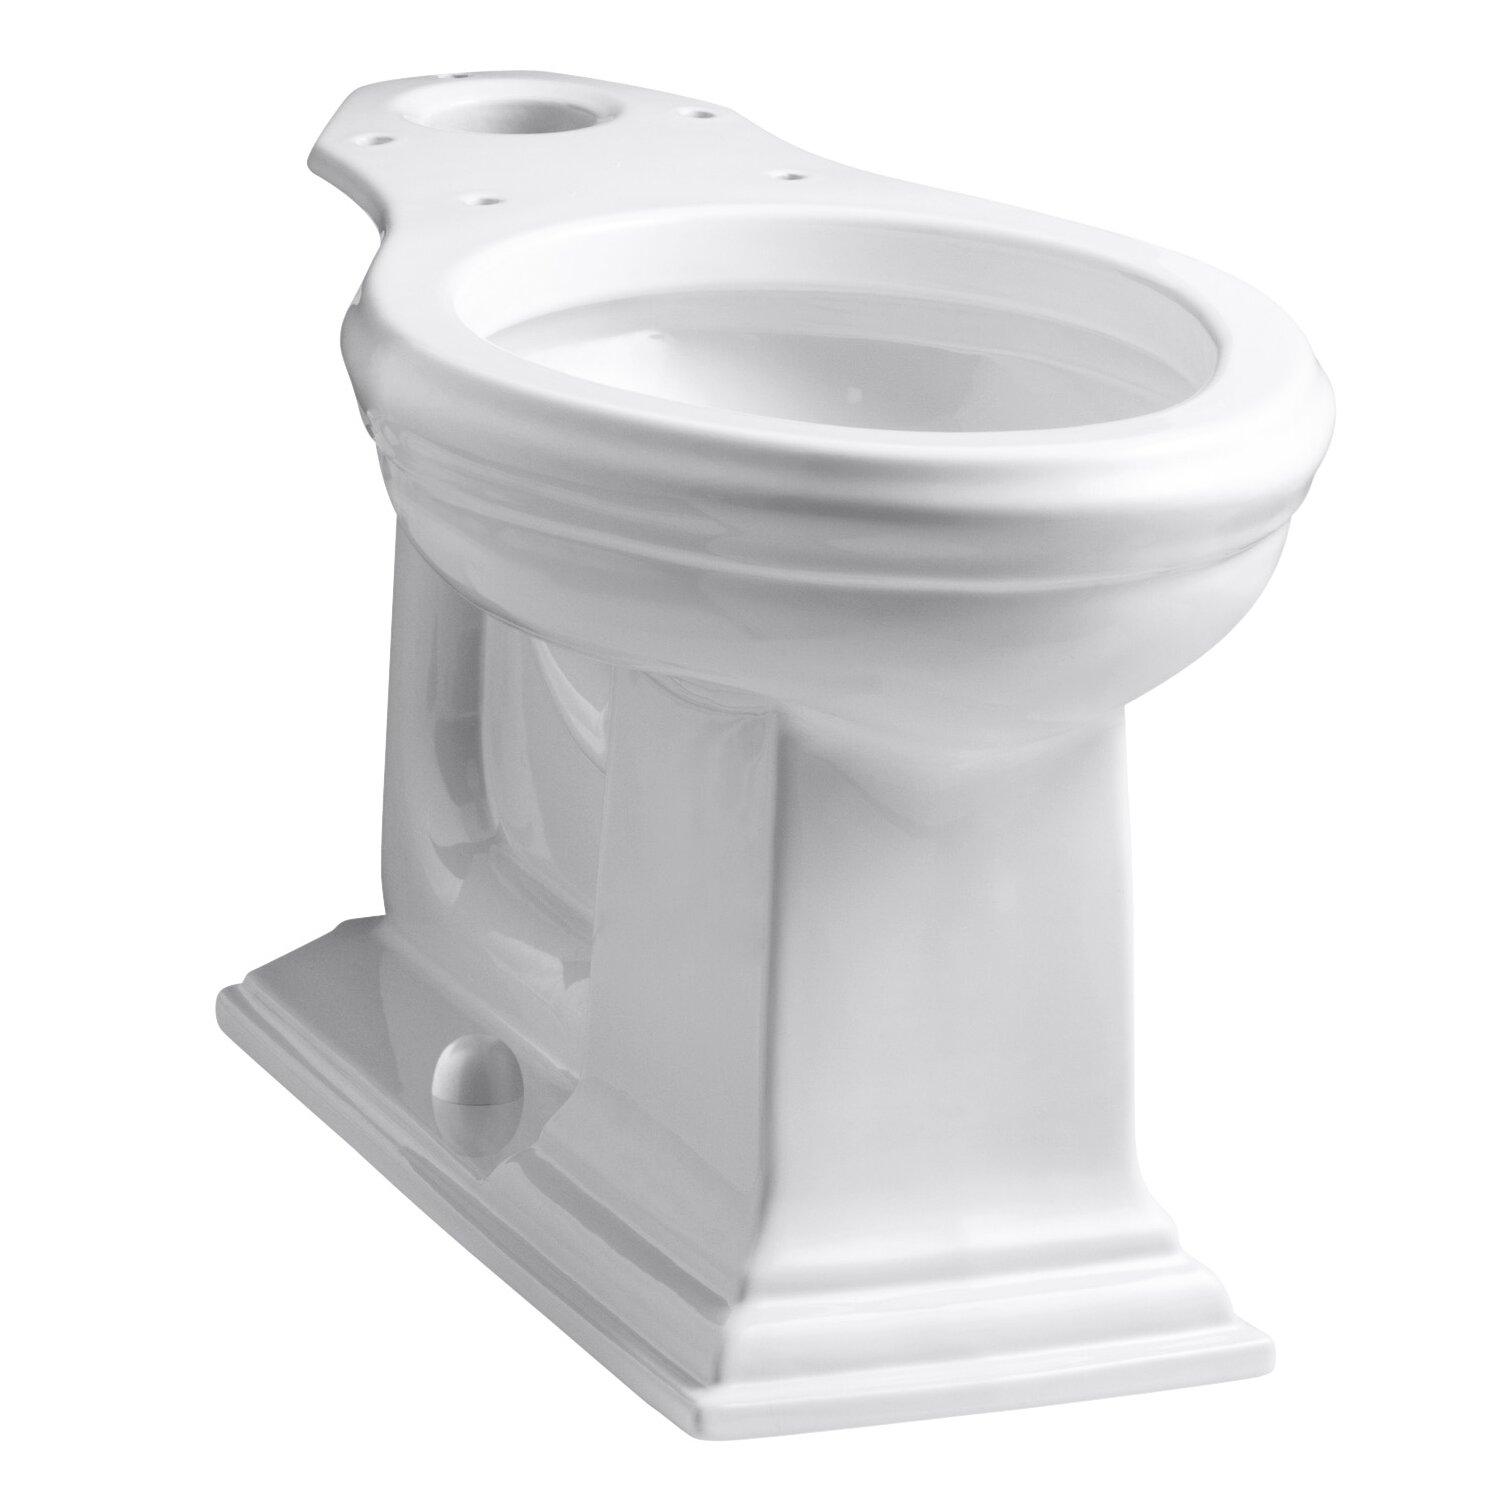 Kohler Memoirs Comfort Height Elongated Toilet Bowl